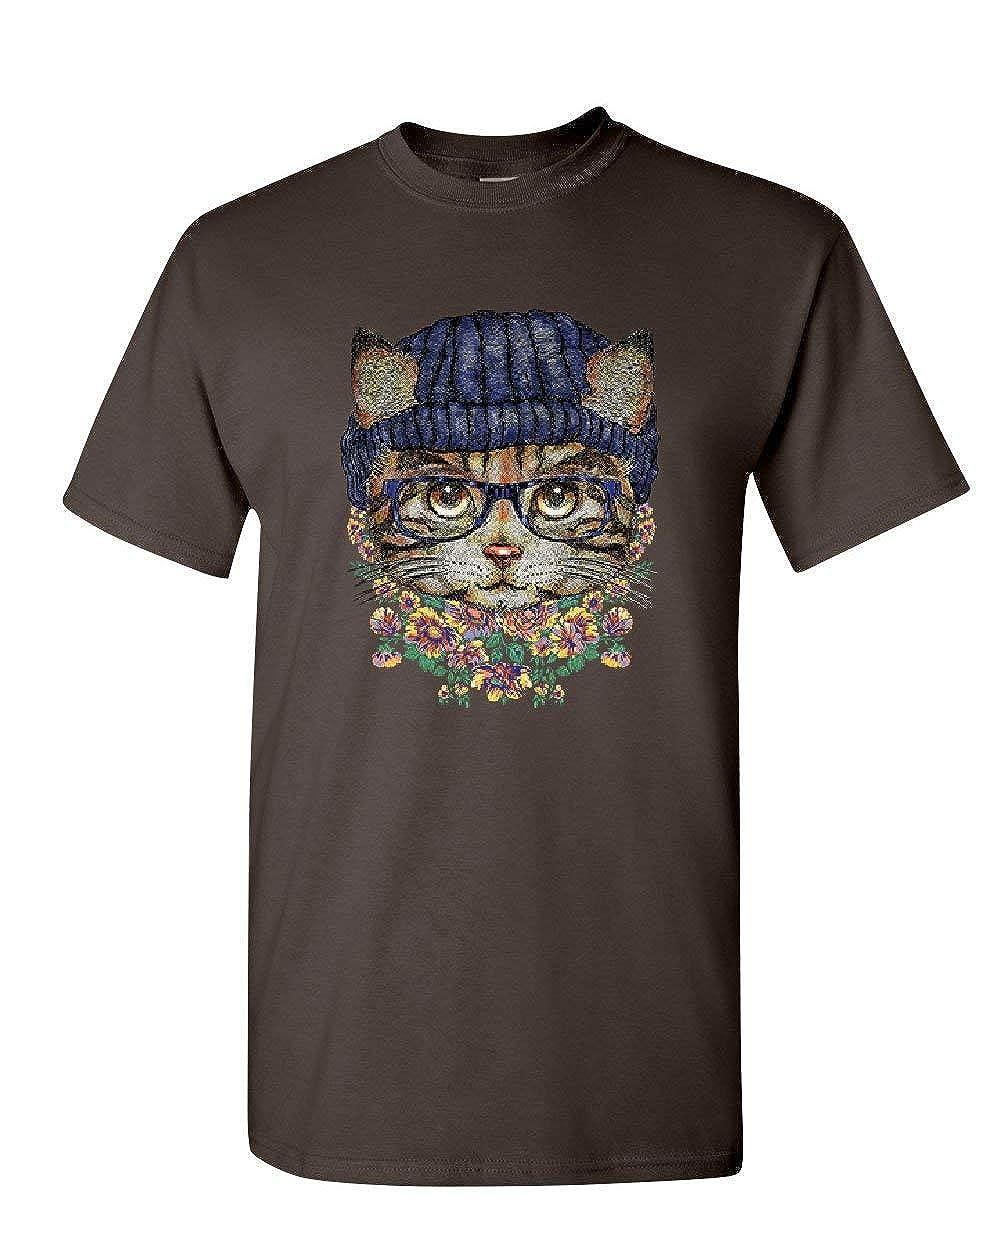 Hipster Kitty in Glasses Beanie T-Shirt Cat Kitten Pop Culture Mens Tee Shirt